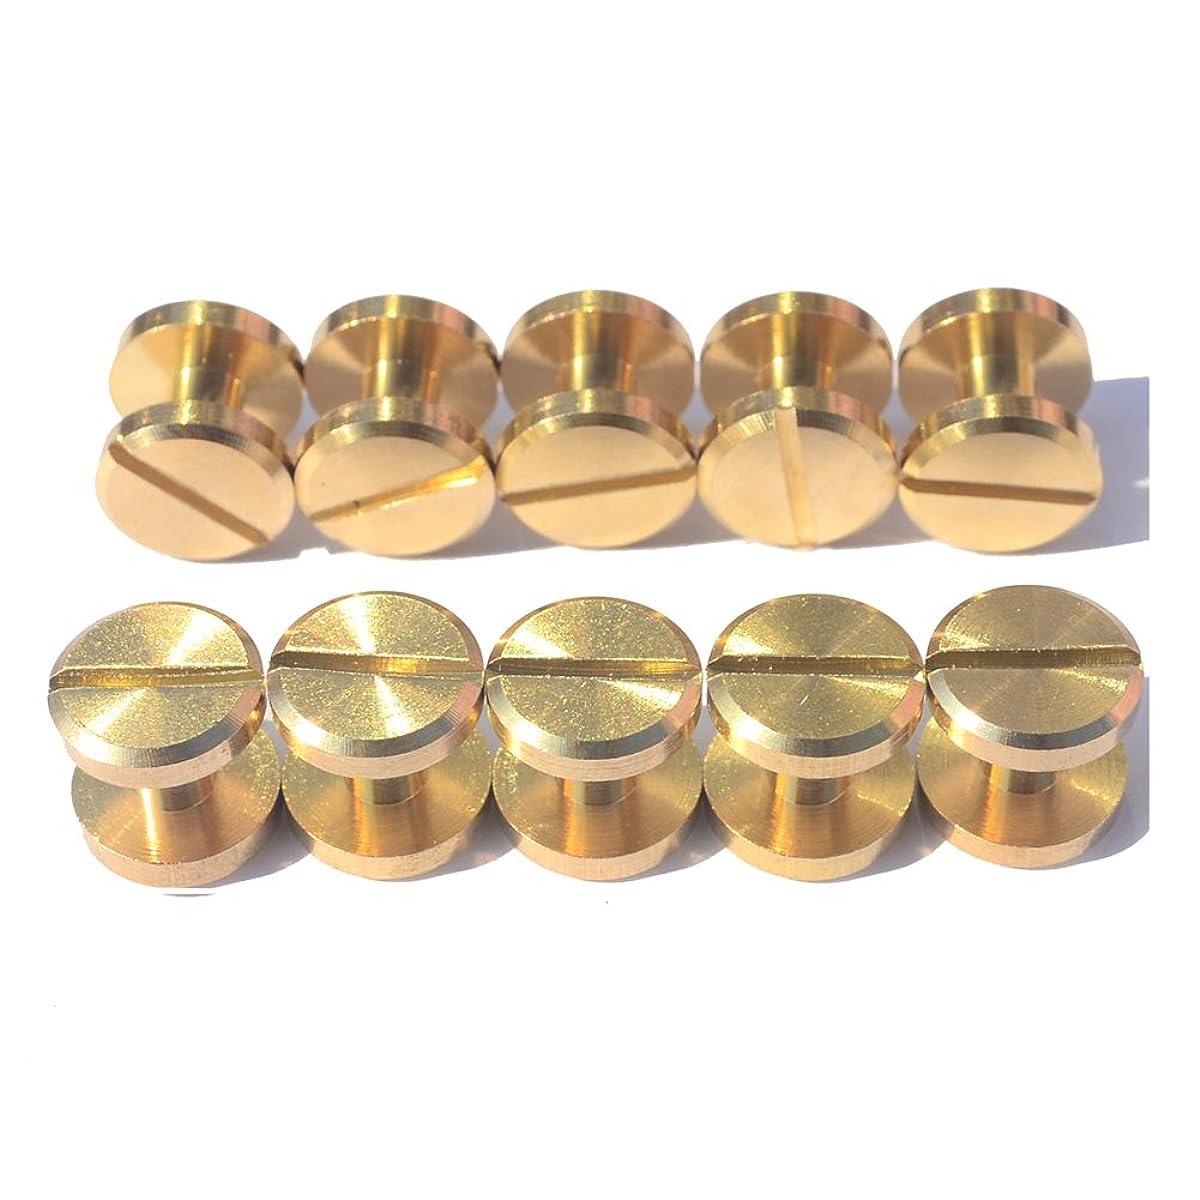 DGOL 50 Pairs Brass Backscrews Golden Leather Fasteners Sturdy Binding Rivets Belt Strap Collar Back Screws PU Studs Length (0.158inch(4mm))